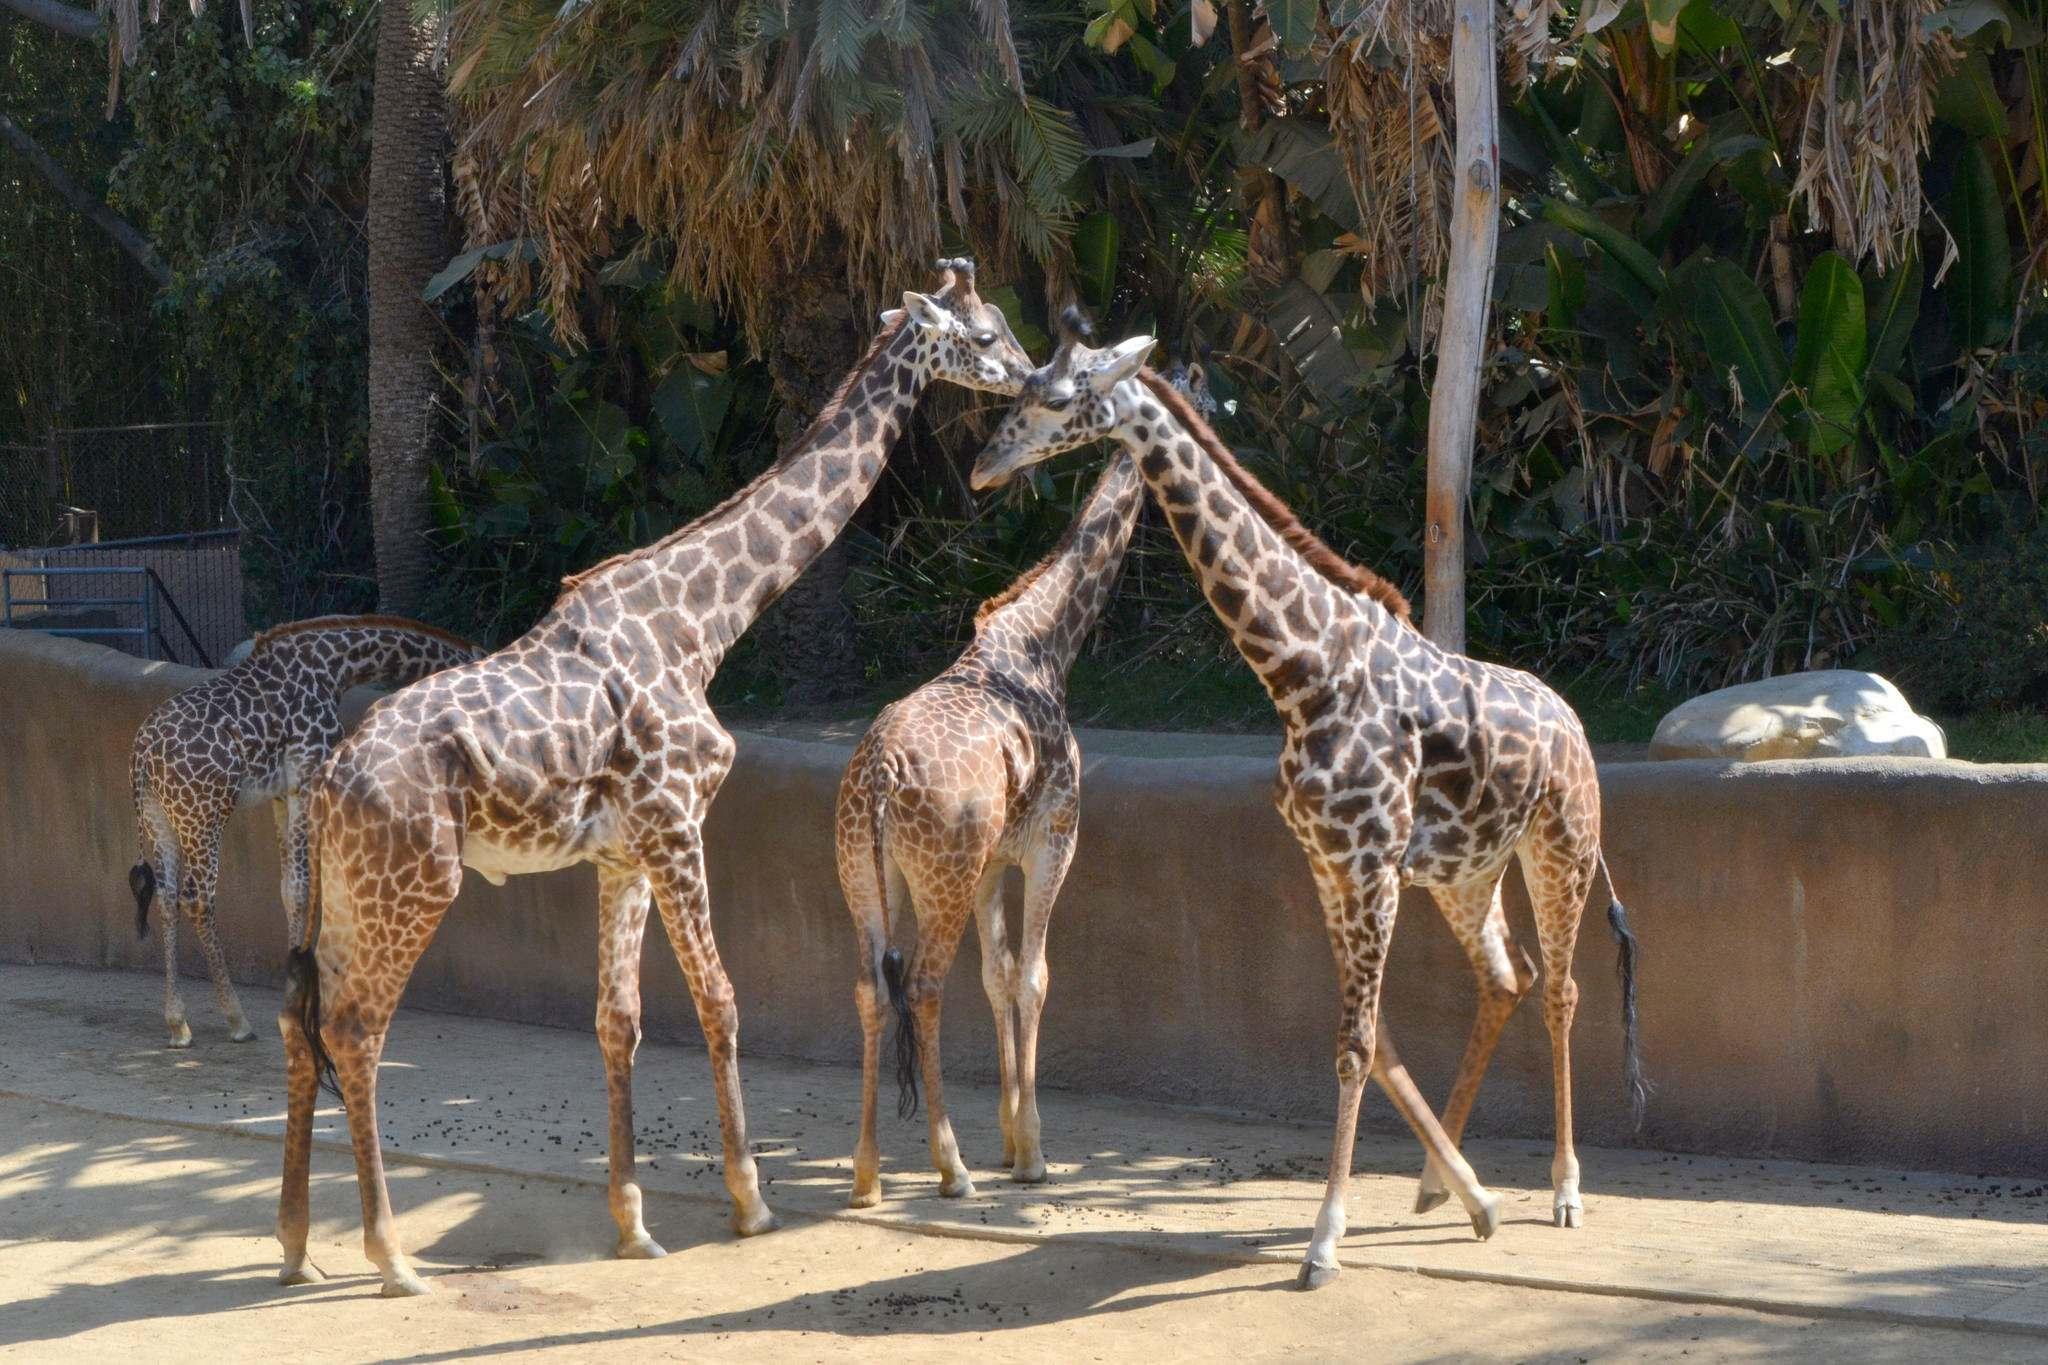 los angeles zoo4 Los Angeles Zoo Facts